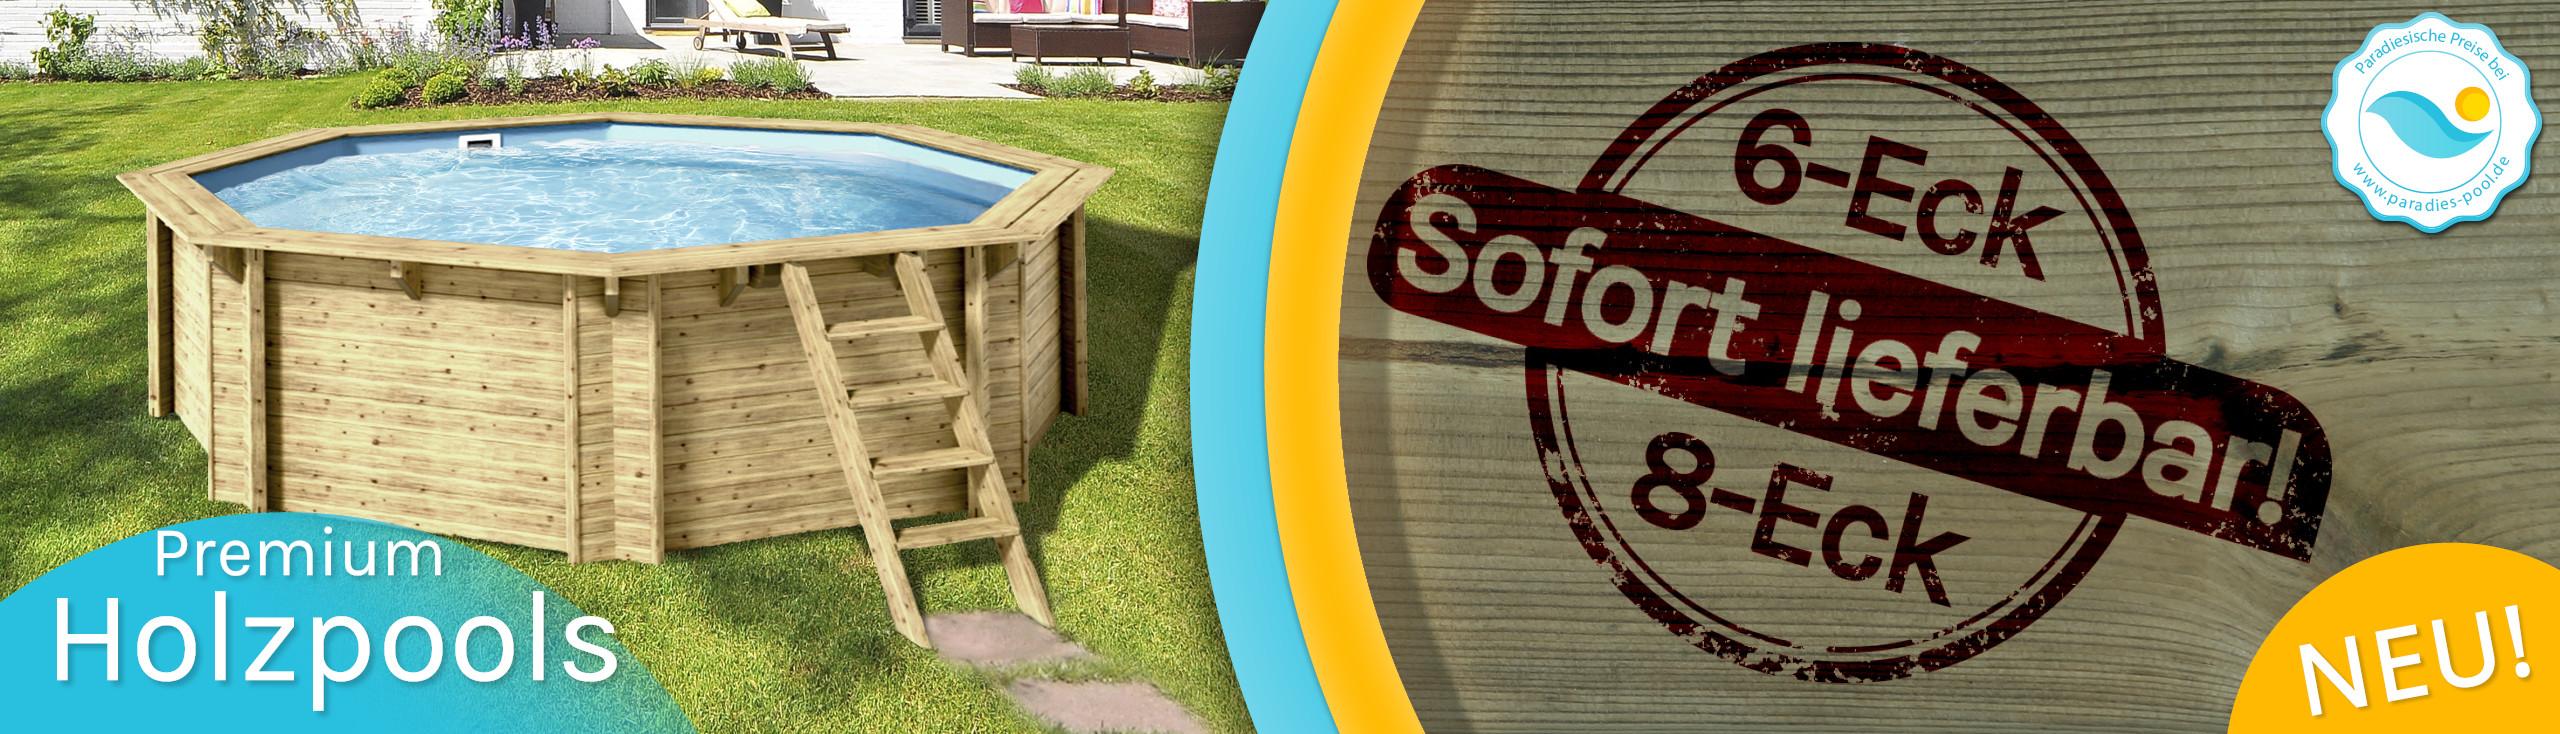 Premium Holzpools bei Paradies Pool